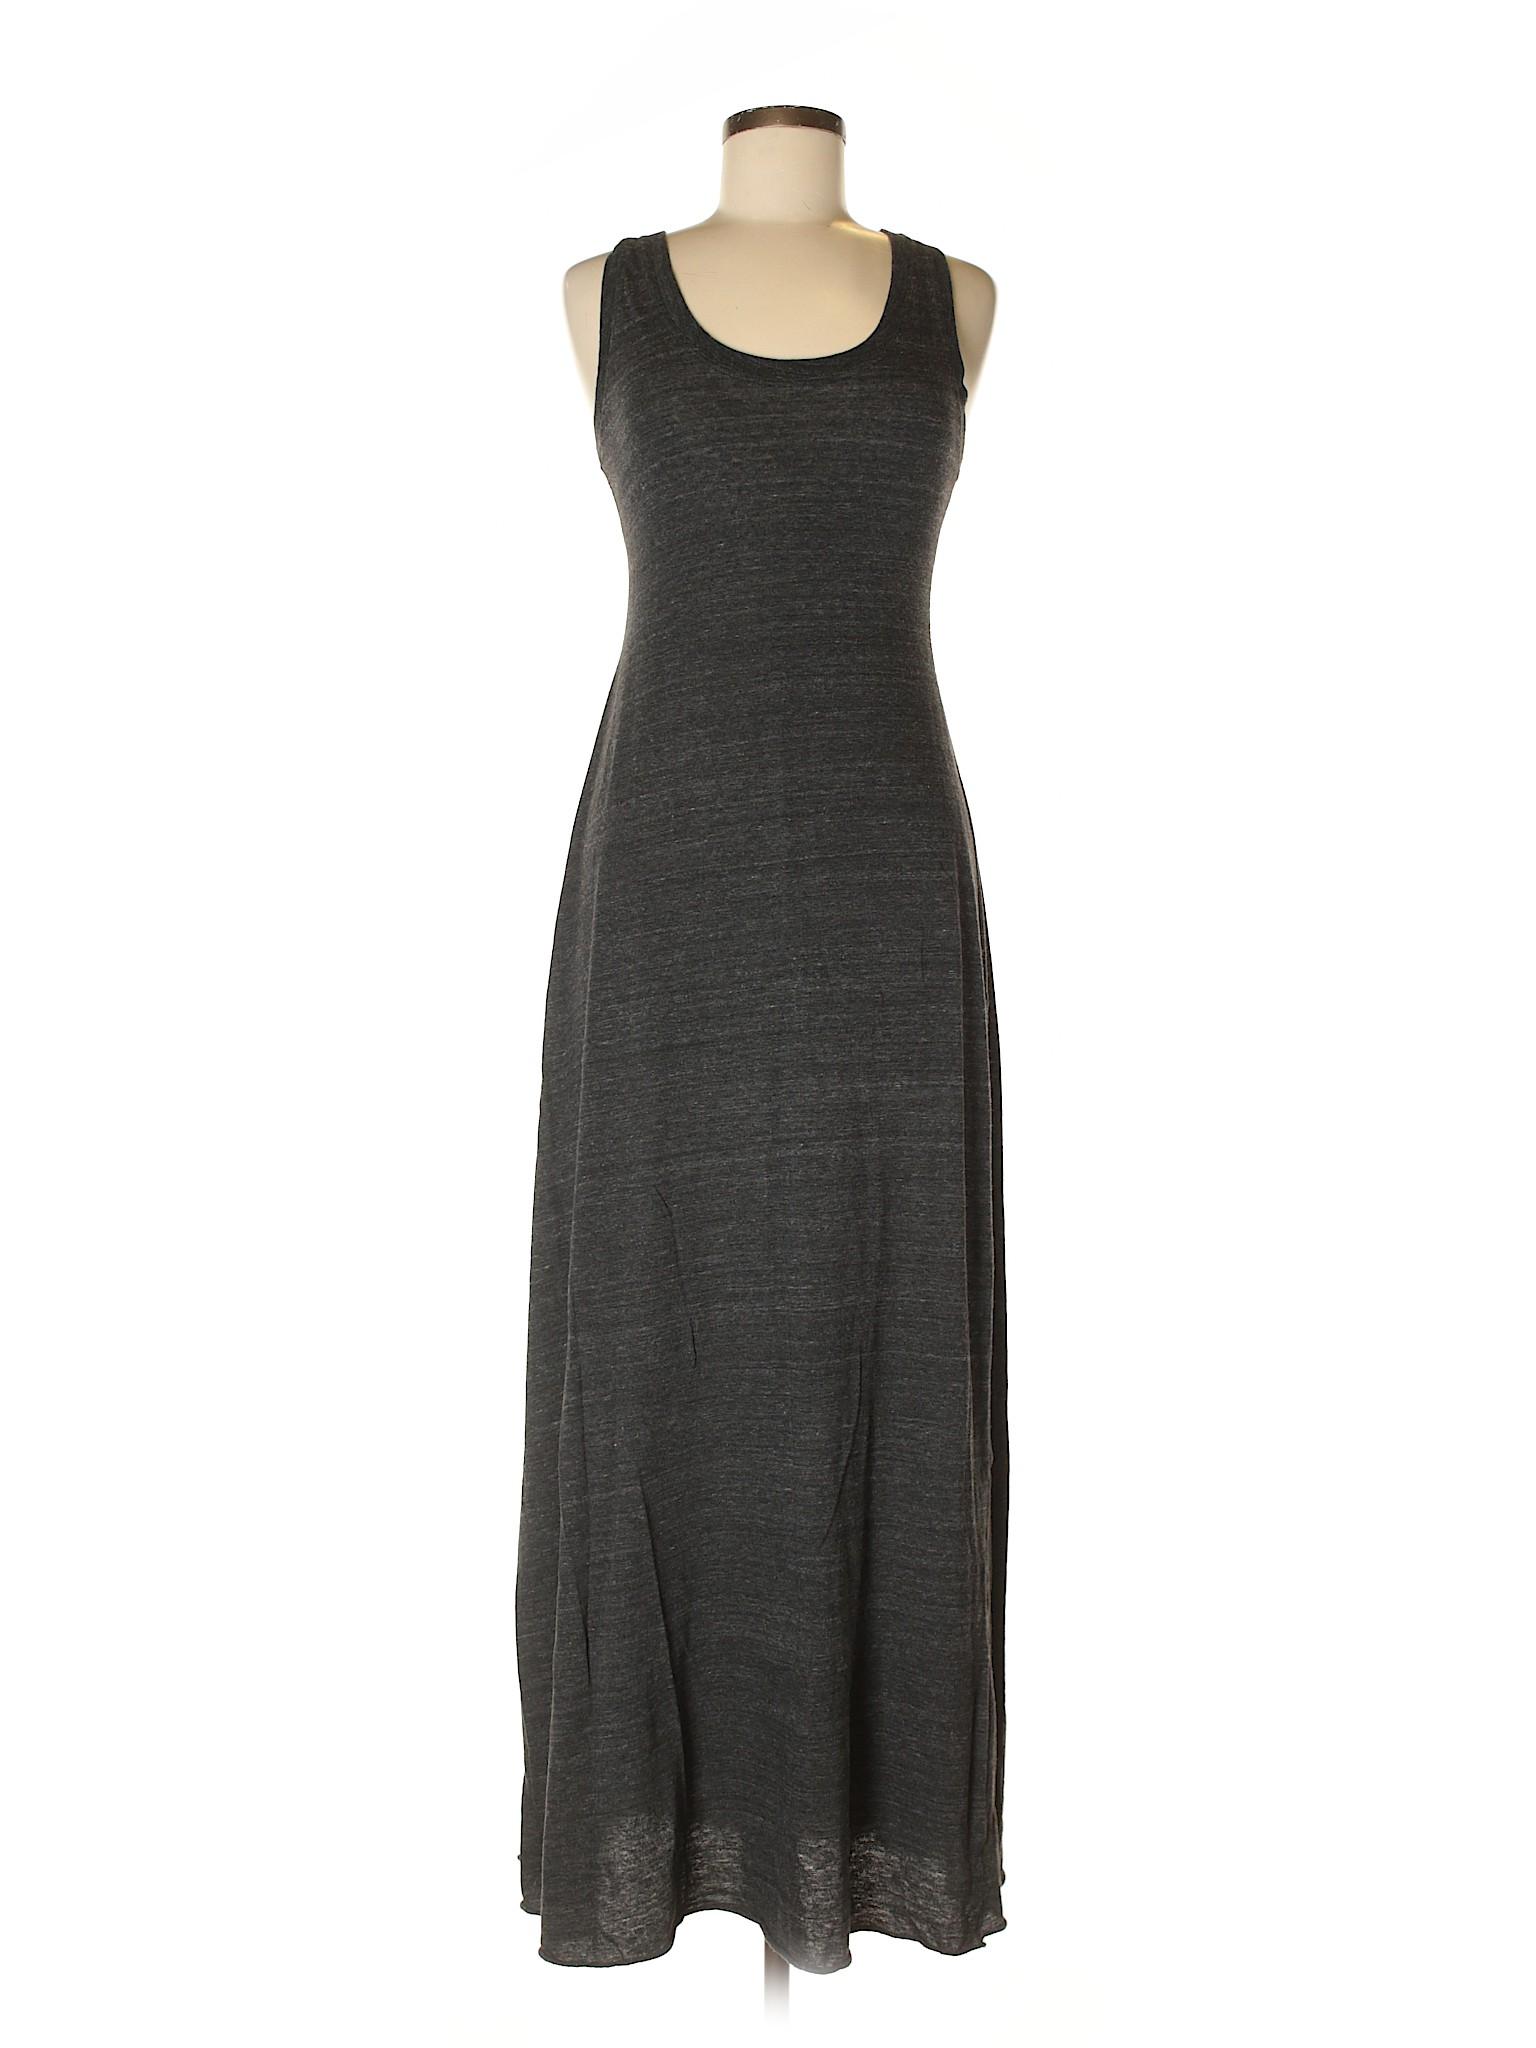 Earth Casual Boutique winter Dress Alternative Xw6UH